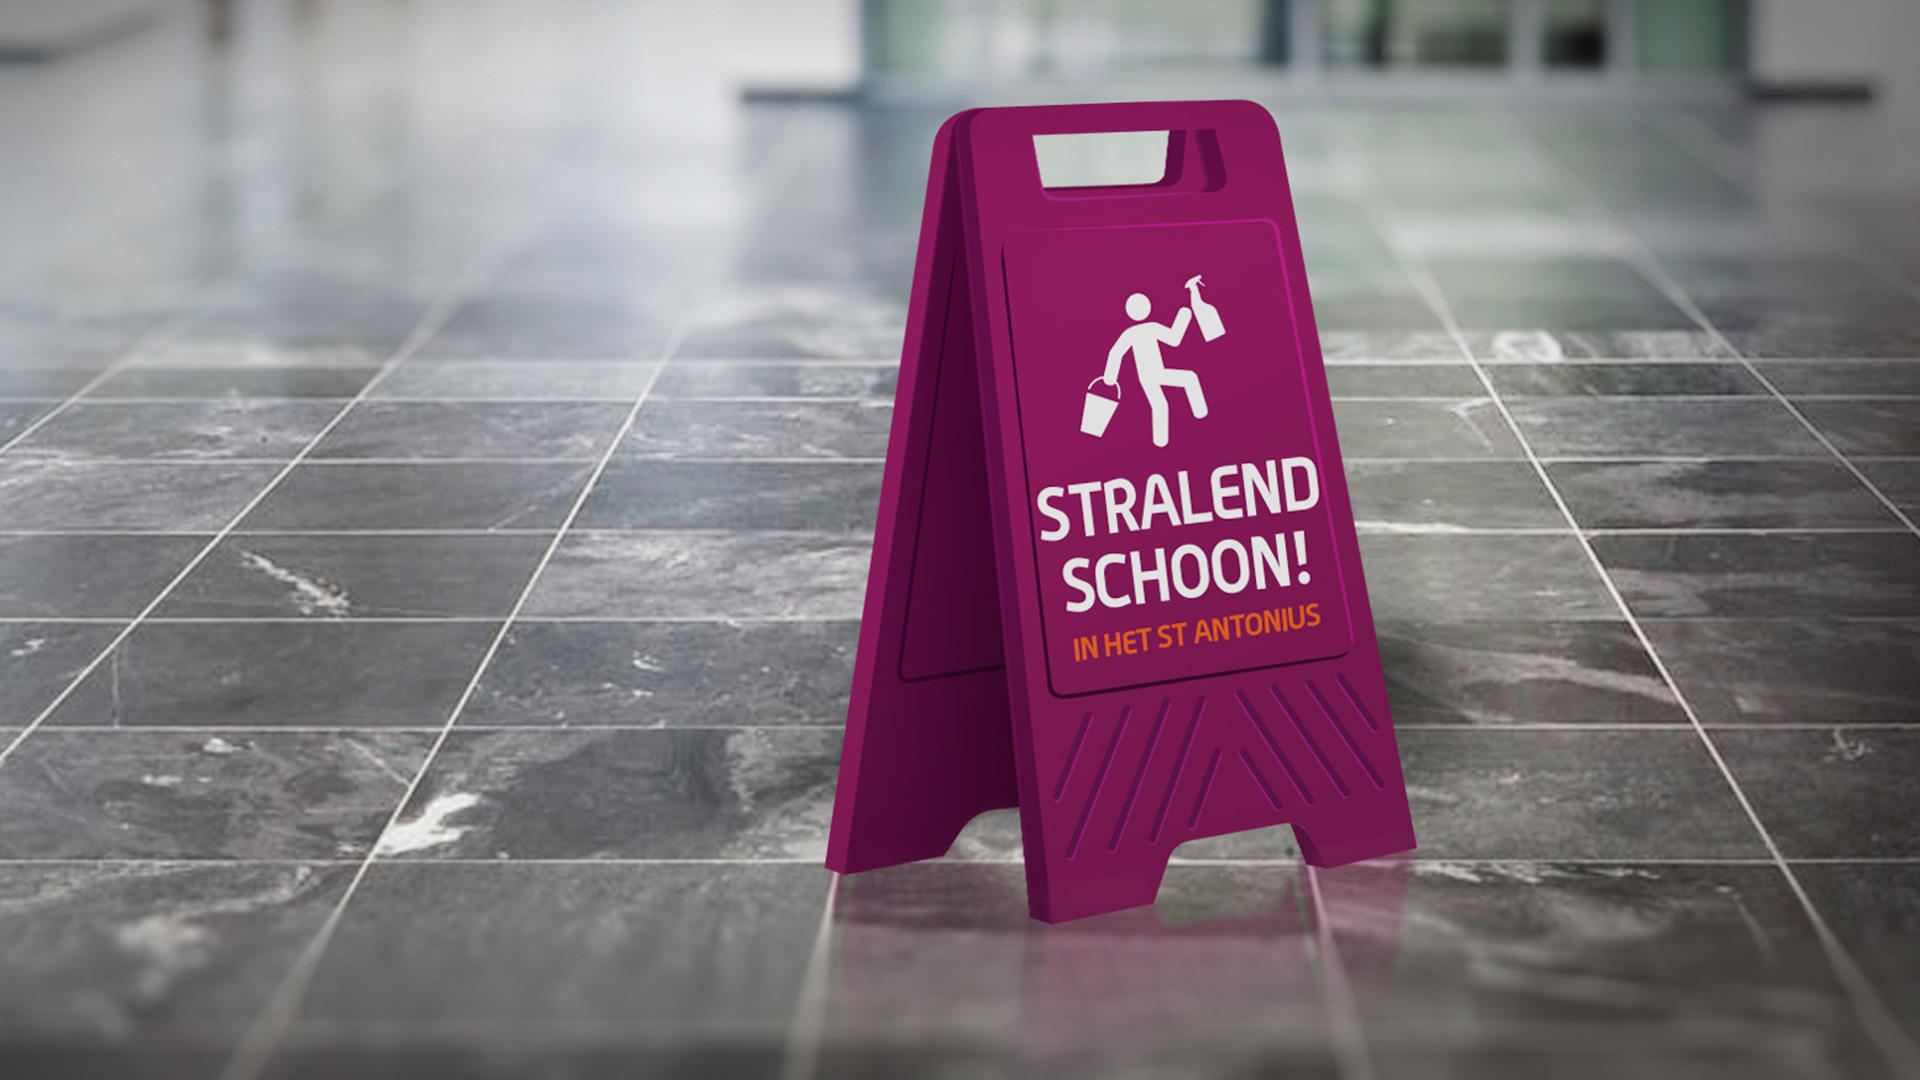 Stralend-schoon-visual.jpg